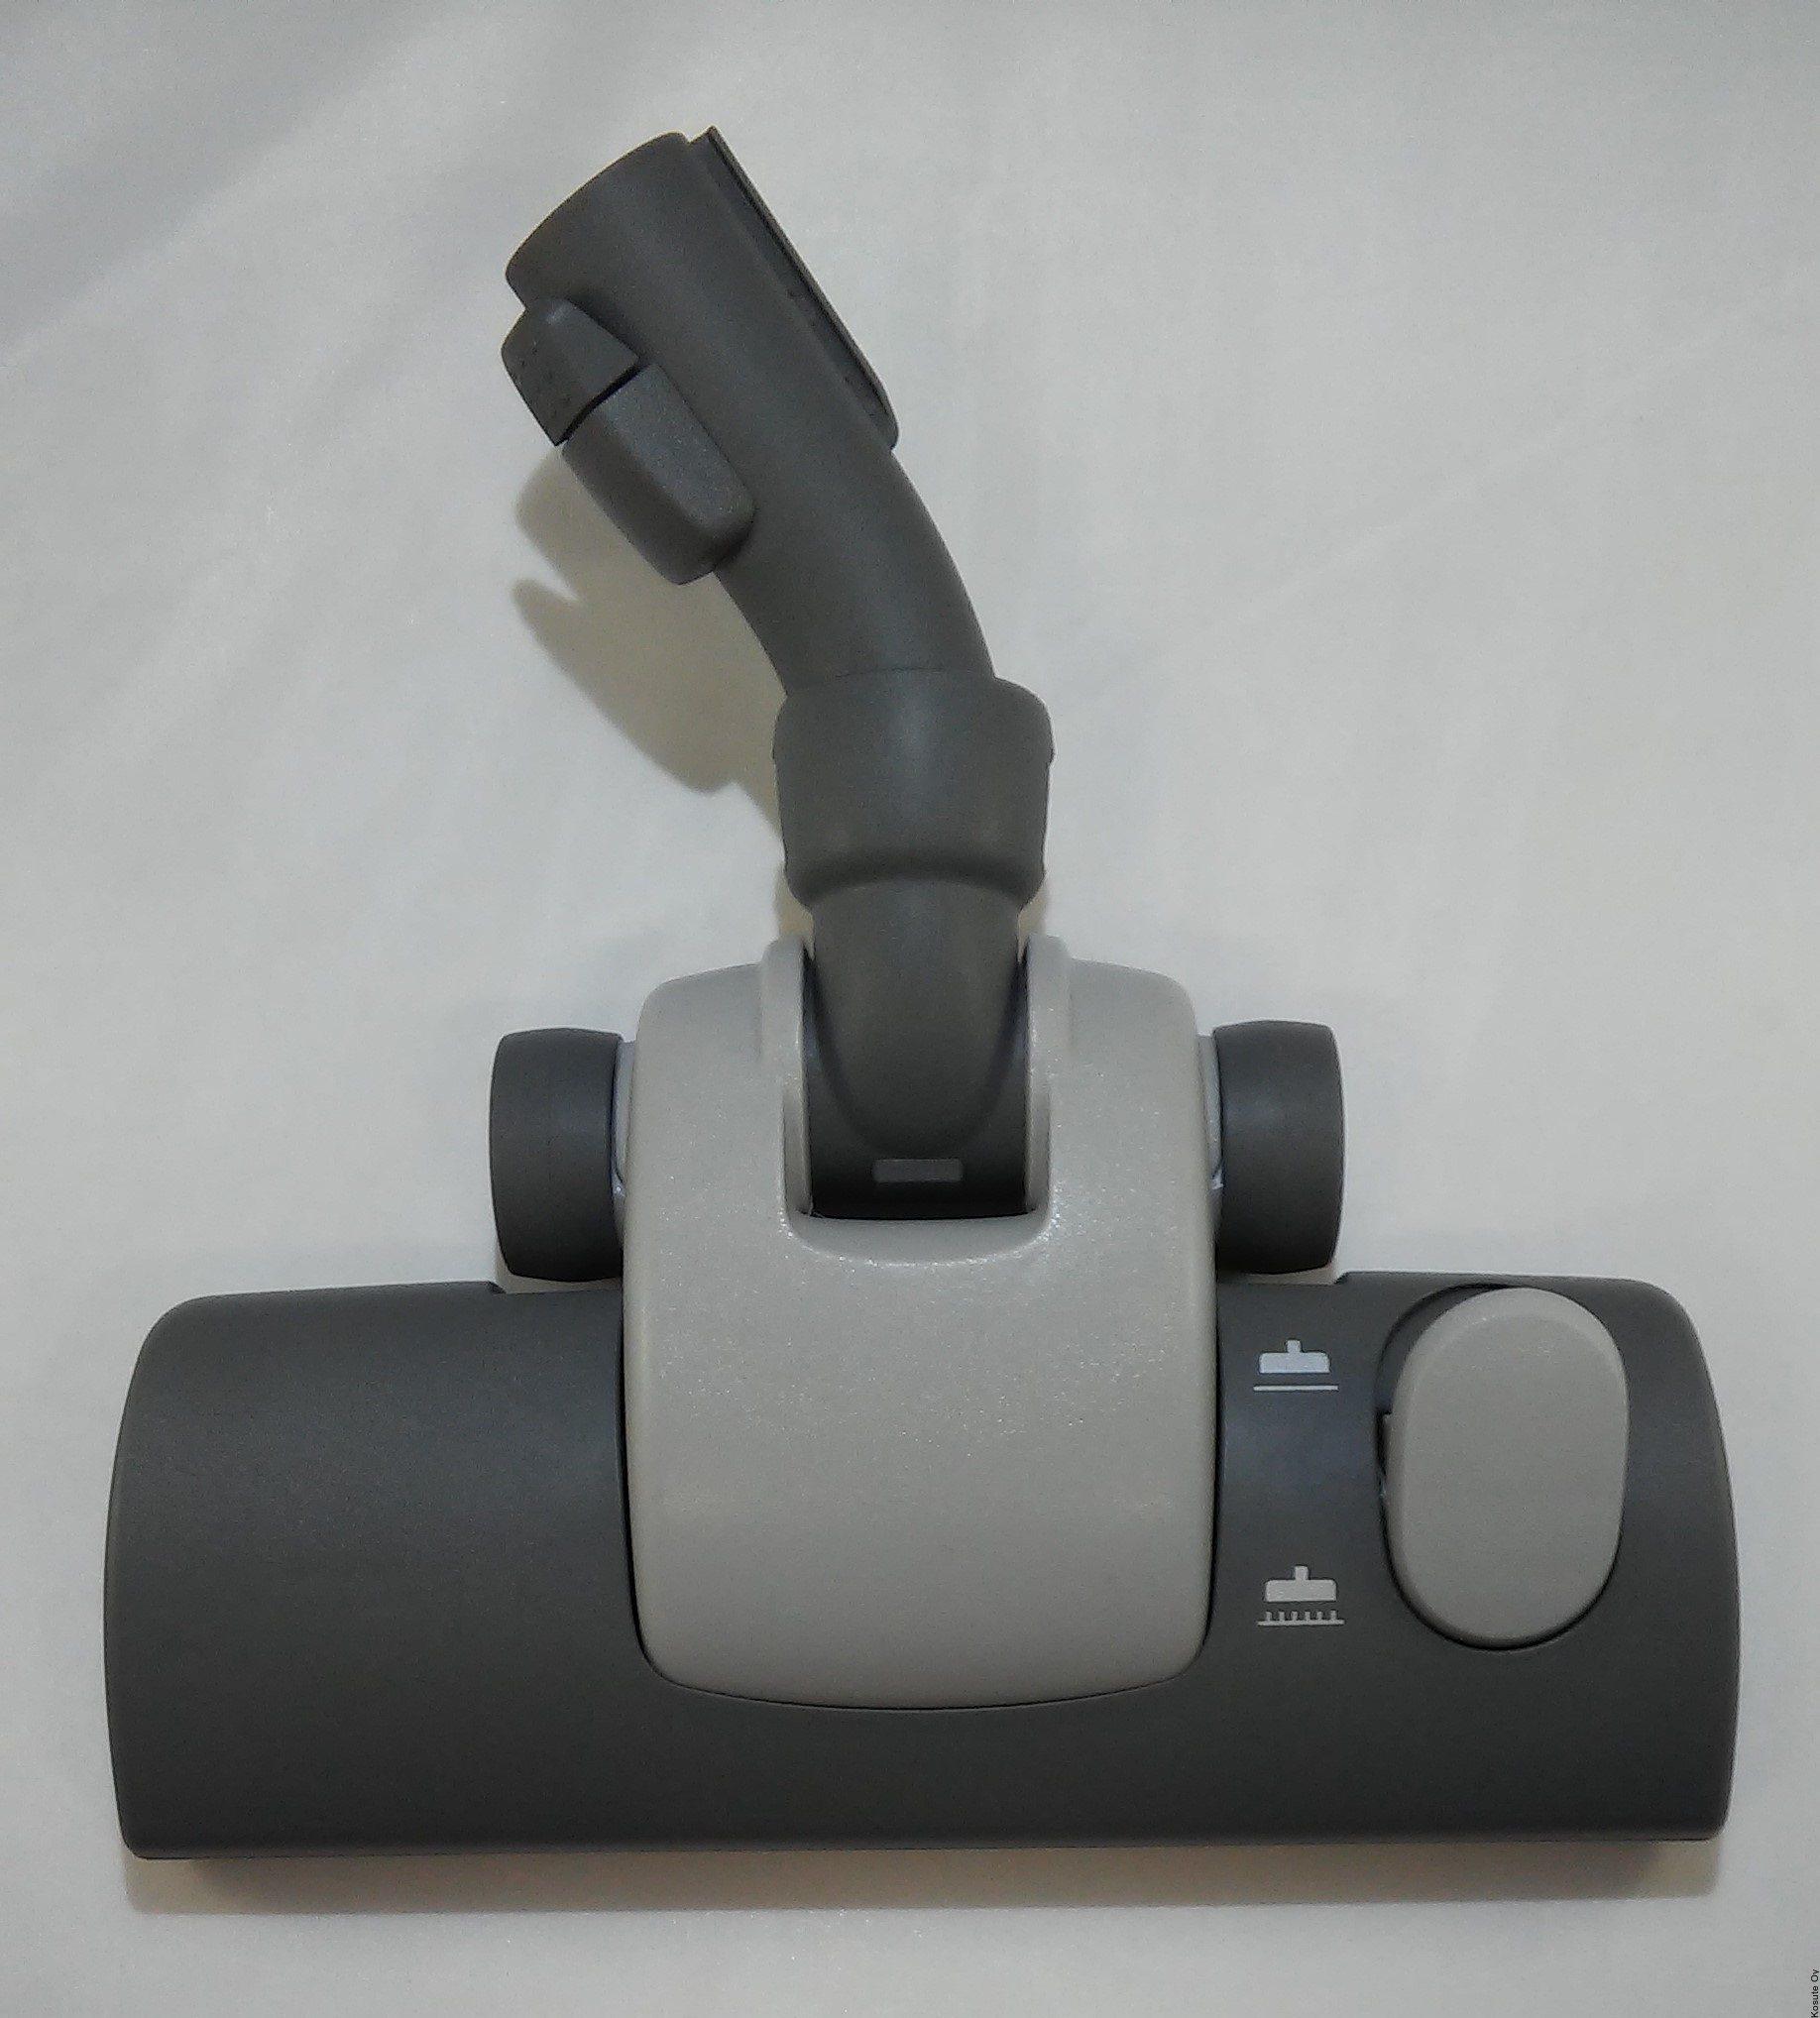 Perfect Care mini turbo harja 36 mm ovaali yhdistyskappale